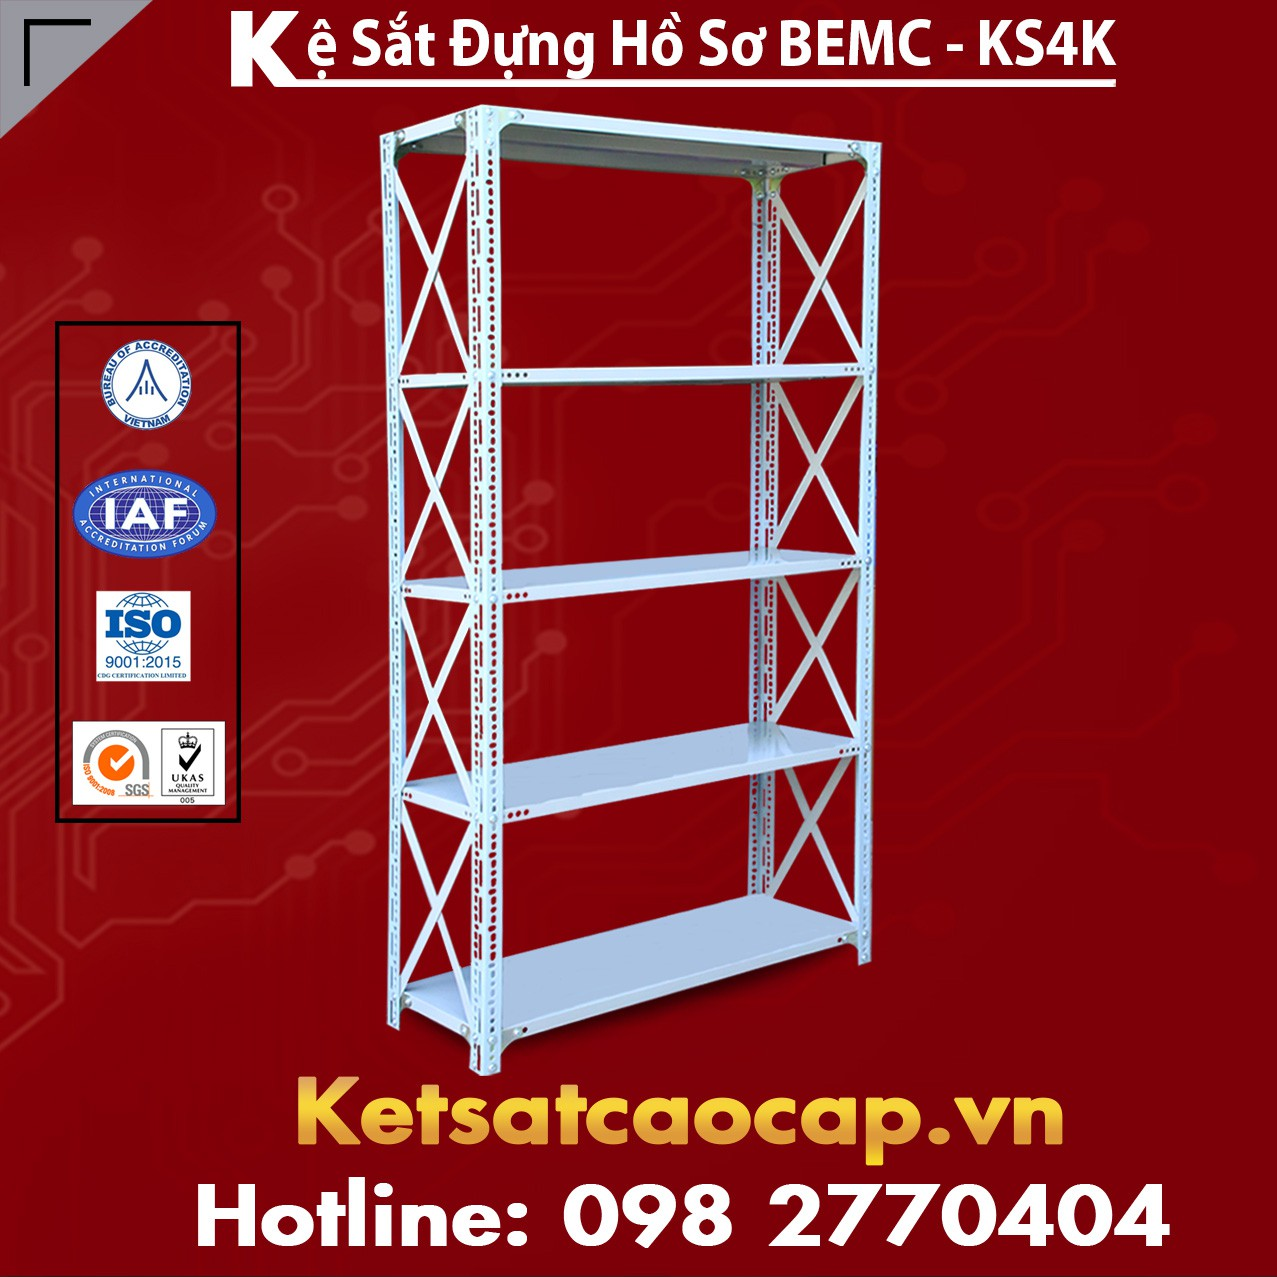 Kệ Sắt BEMC - KS4K